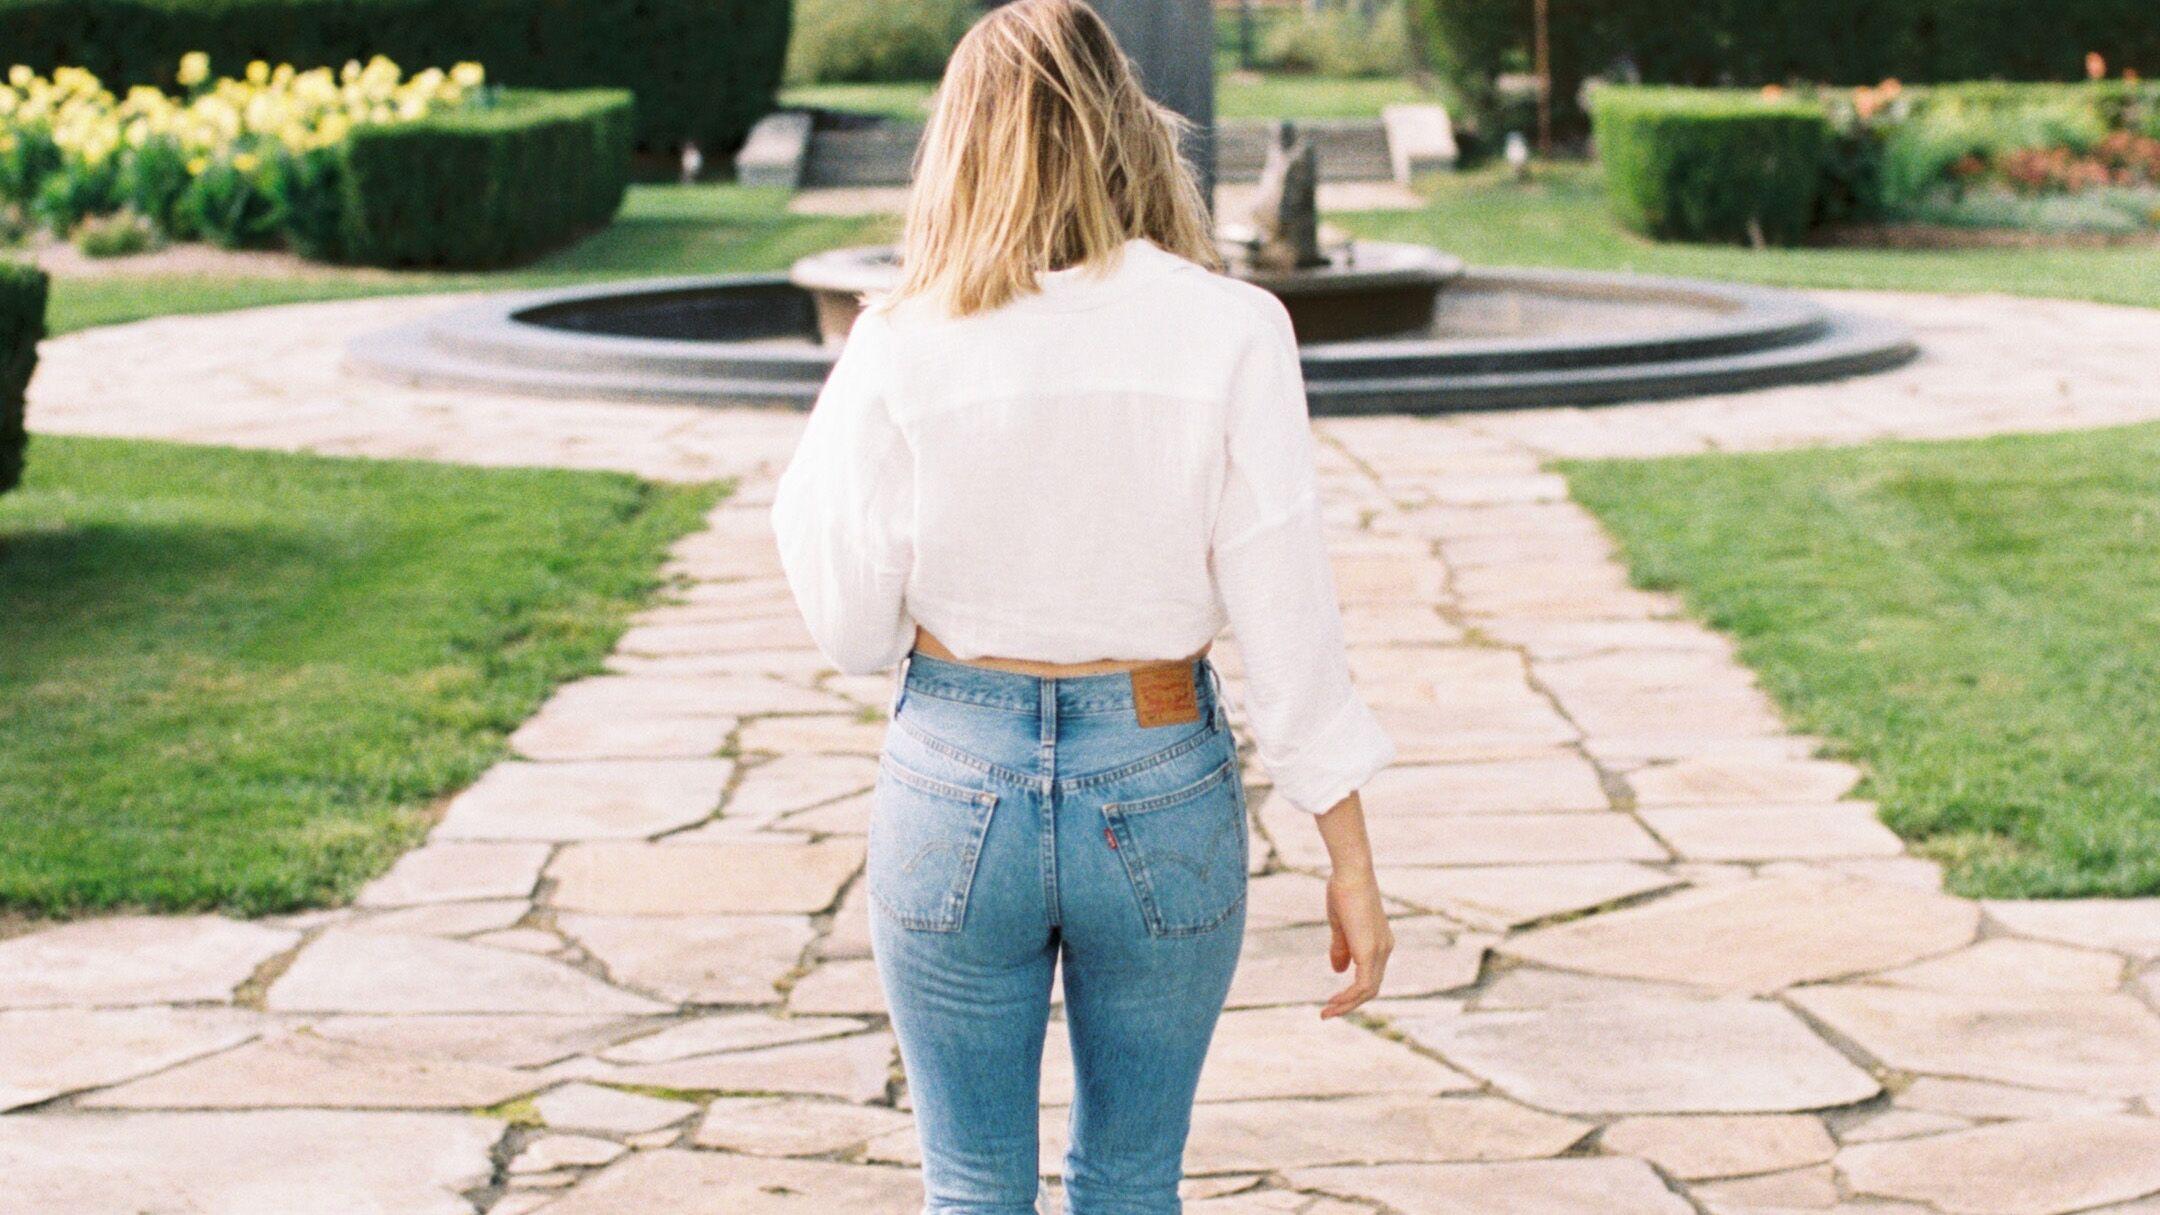 pantalon femme qui amincit